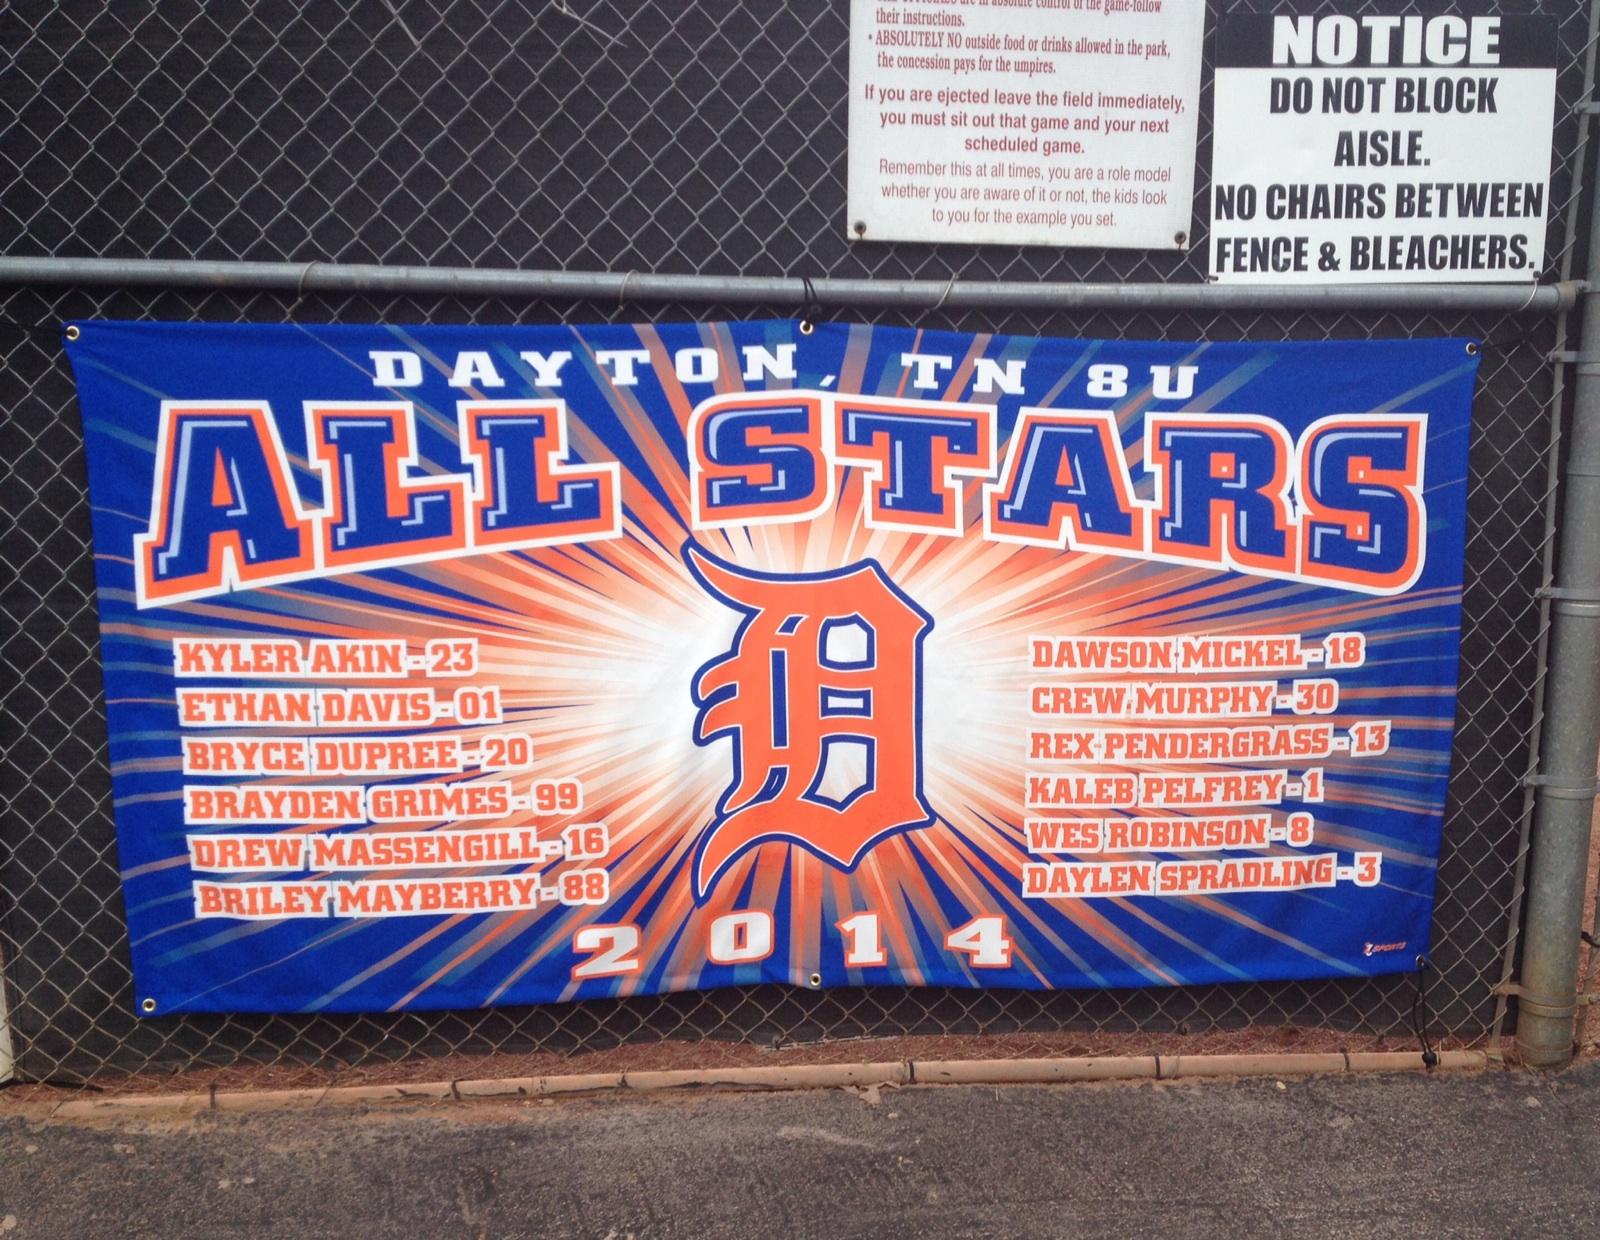 Dayton All-Stars 8U Banner 2014